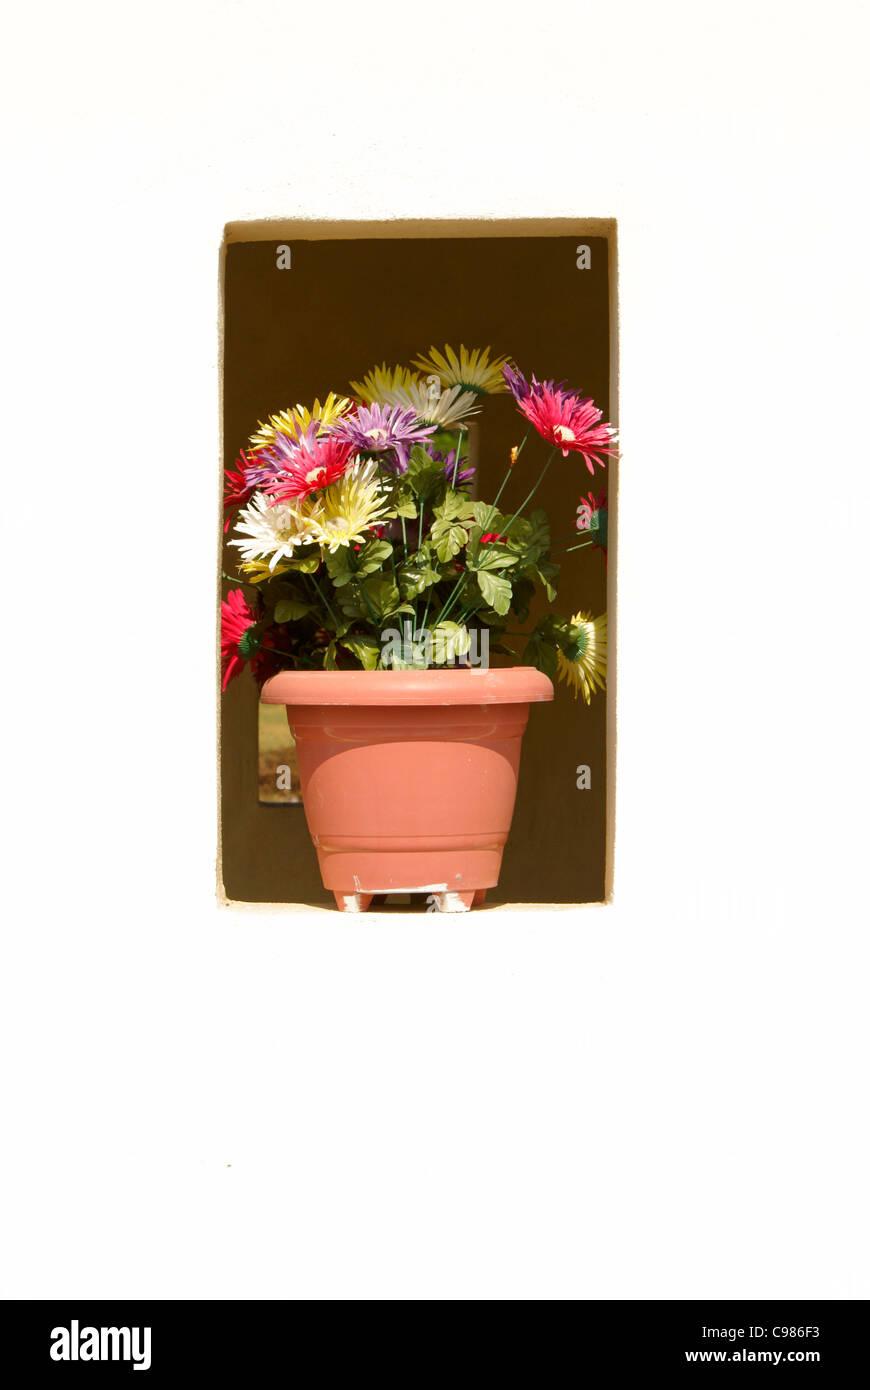 Flowers in the niche of a tomb in the town cemetery, El Quelite near Mazatlan, Sinaloa, Mexico - Stock Image